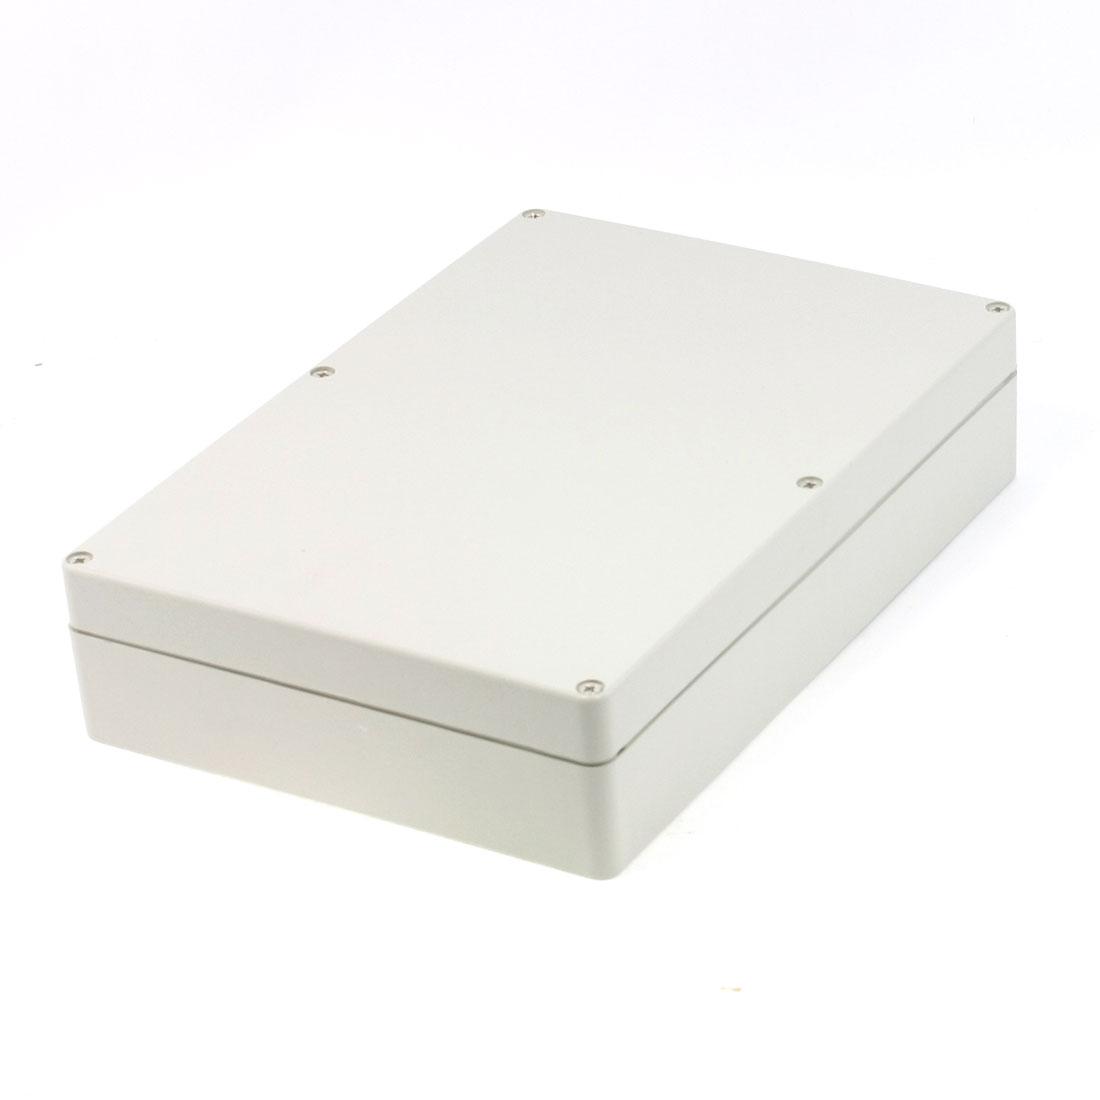 264mm x 184mm x 60mm Waterproof Plastic Enclosure Case DIY Junction Box